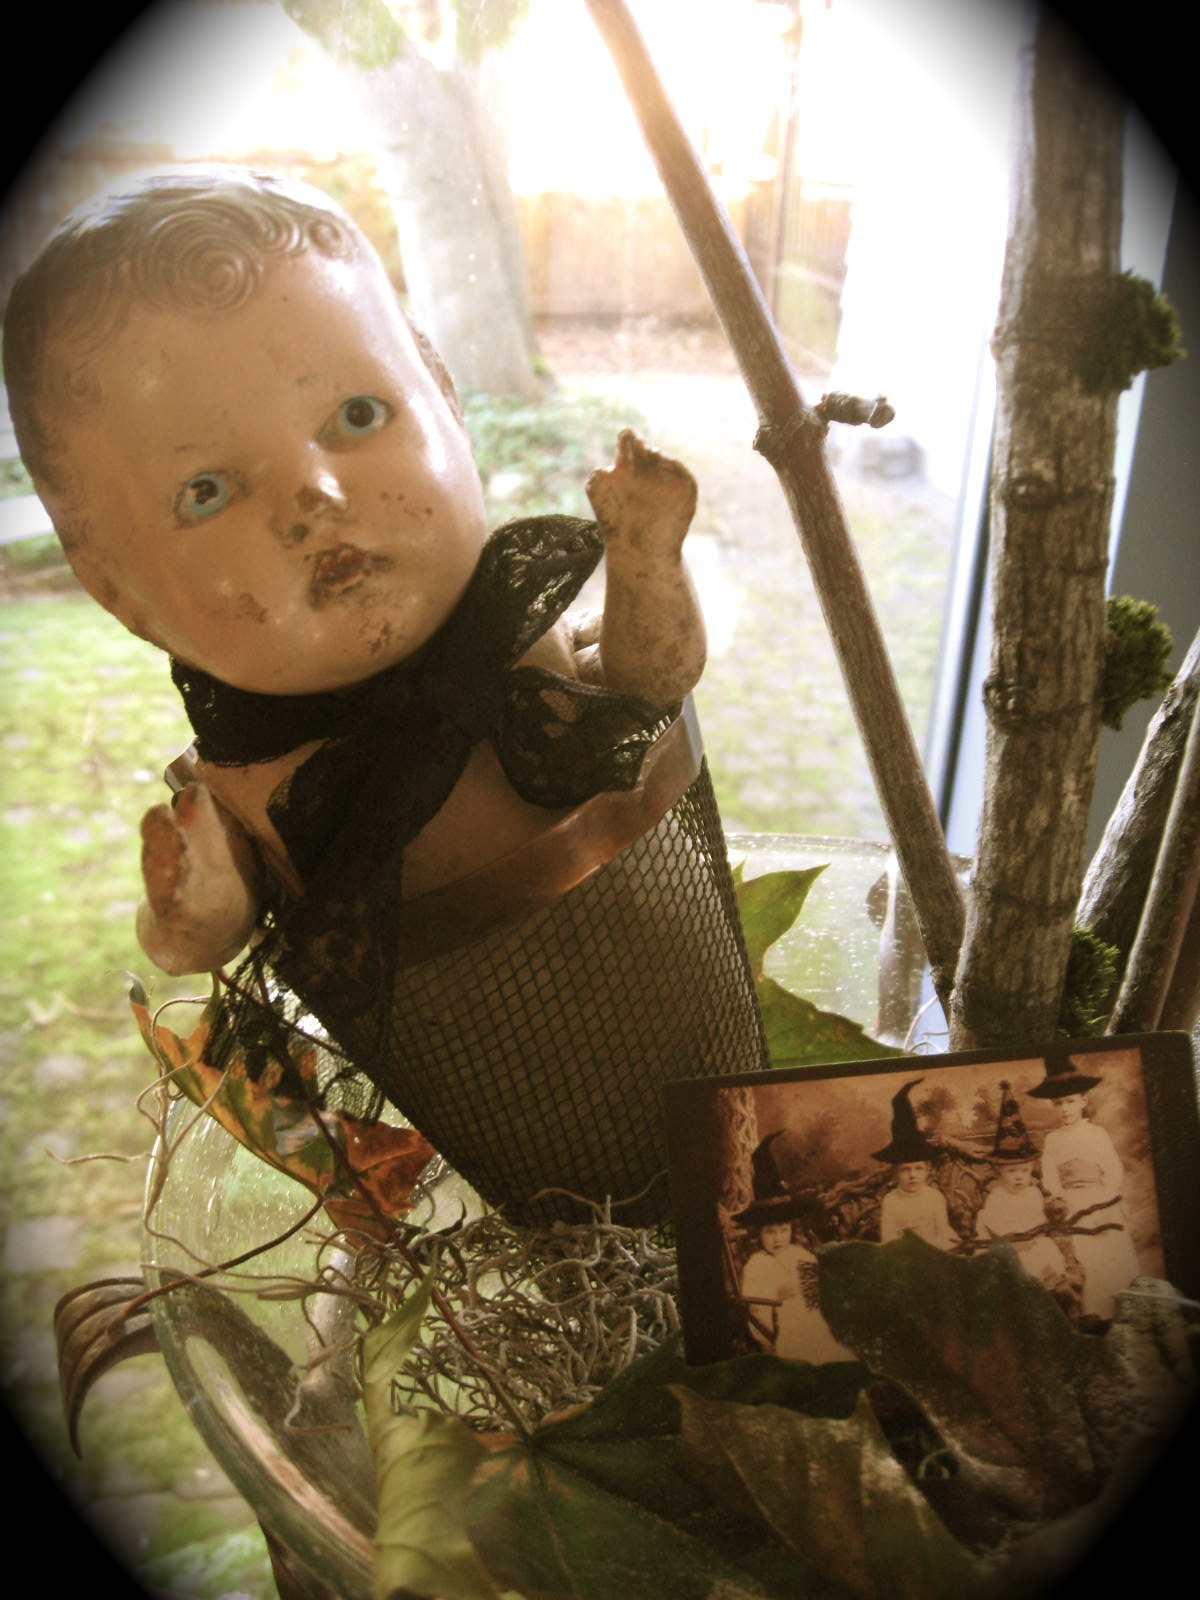 Creepy Dolls Halloween Decorations